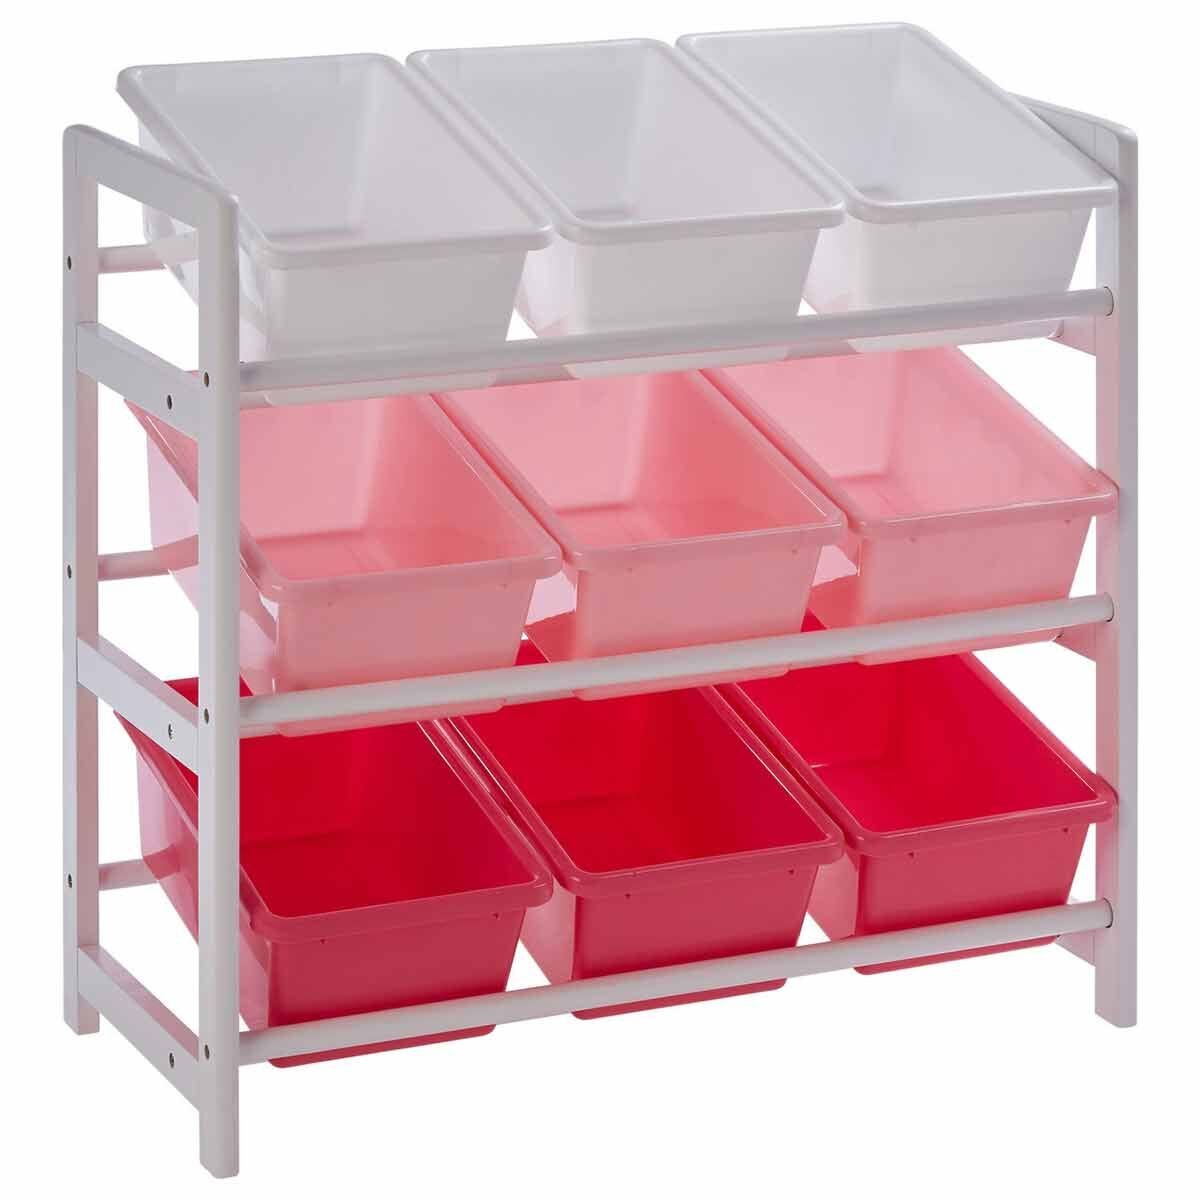 Premier Kids 3 Tier Storage Unit with 9 Plastic Bins Pink